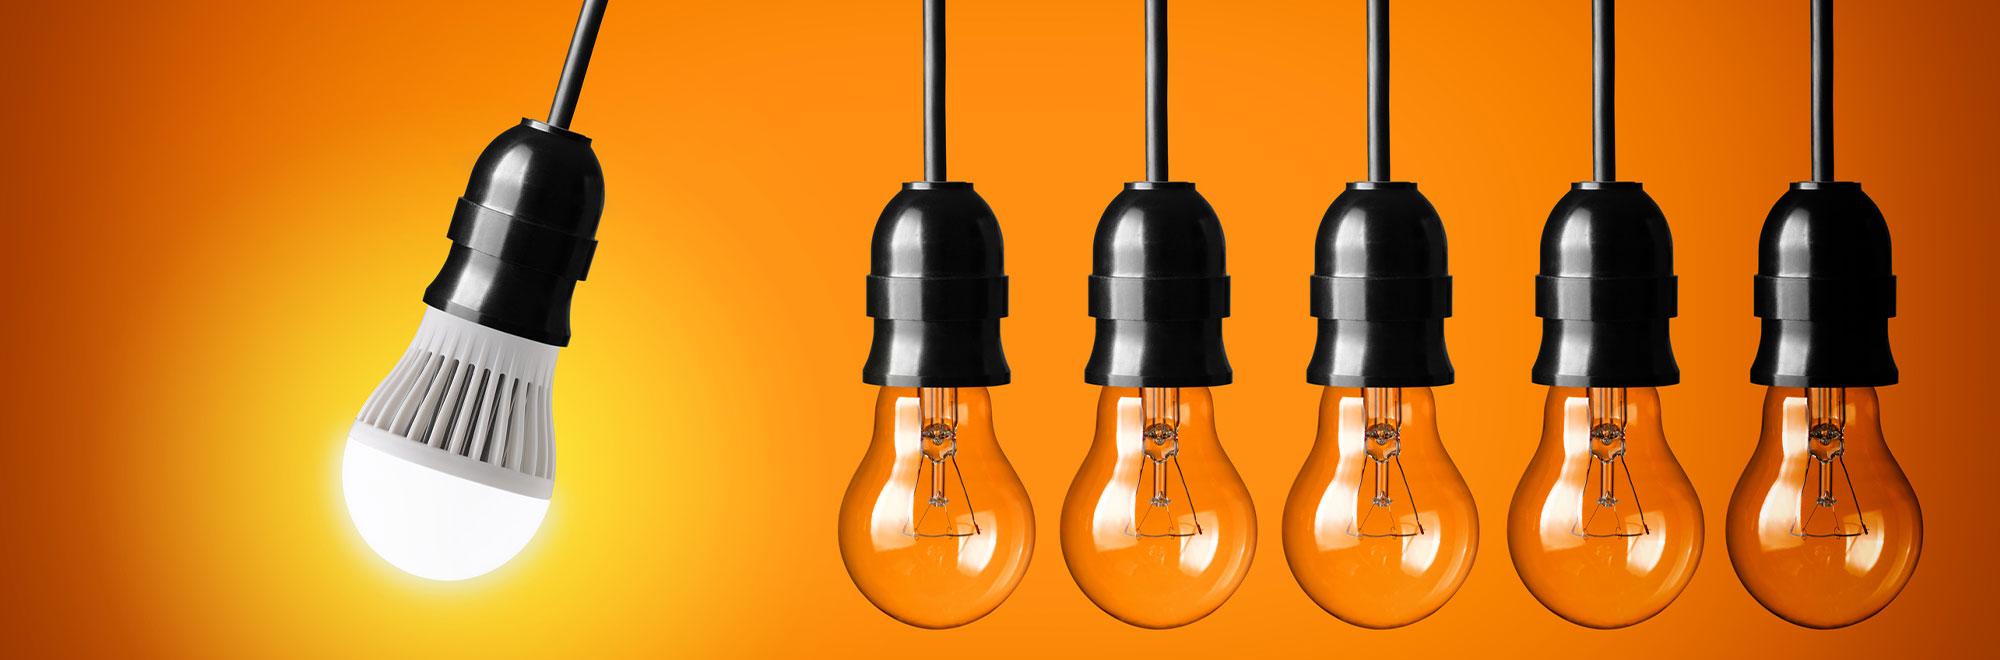 Färber Gas Strom FAQ